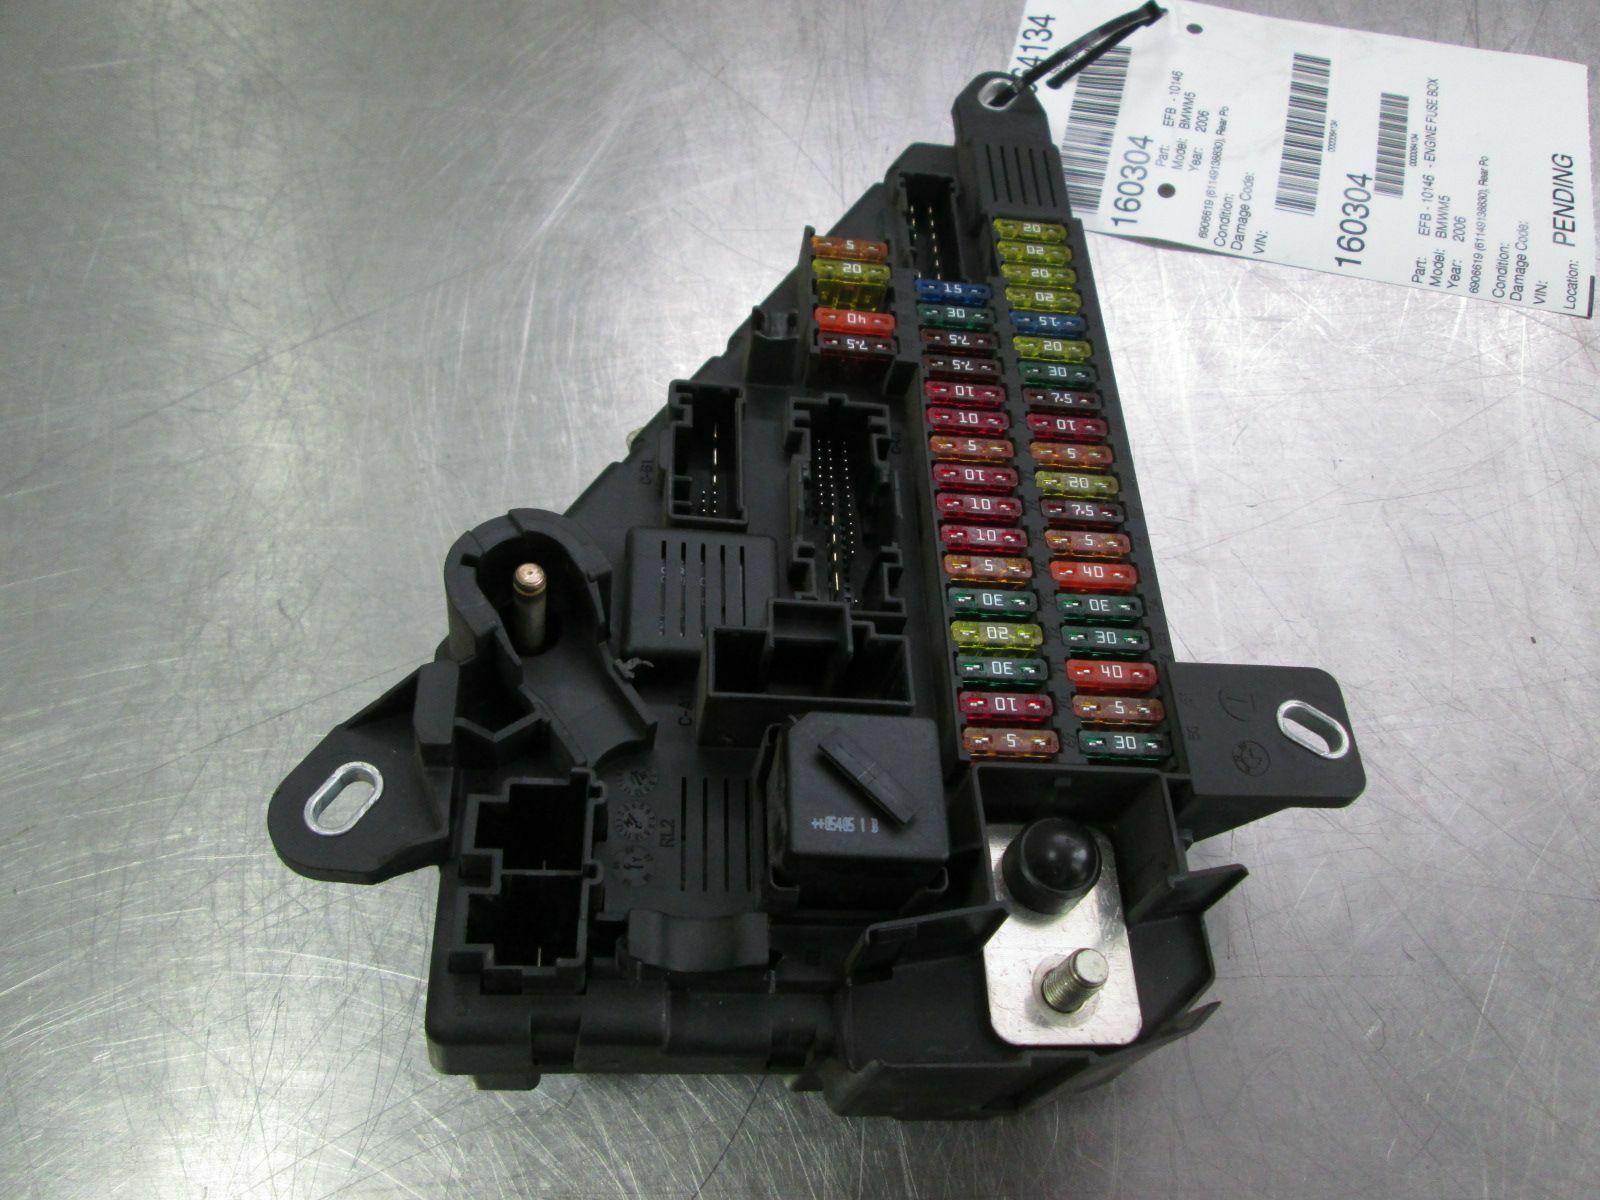 Bmw E30 Fuse Box Wiring Library Toyota Carina 2 M3 Trusted Diagrams G8 E39 M5 Wire